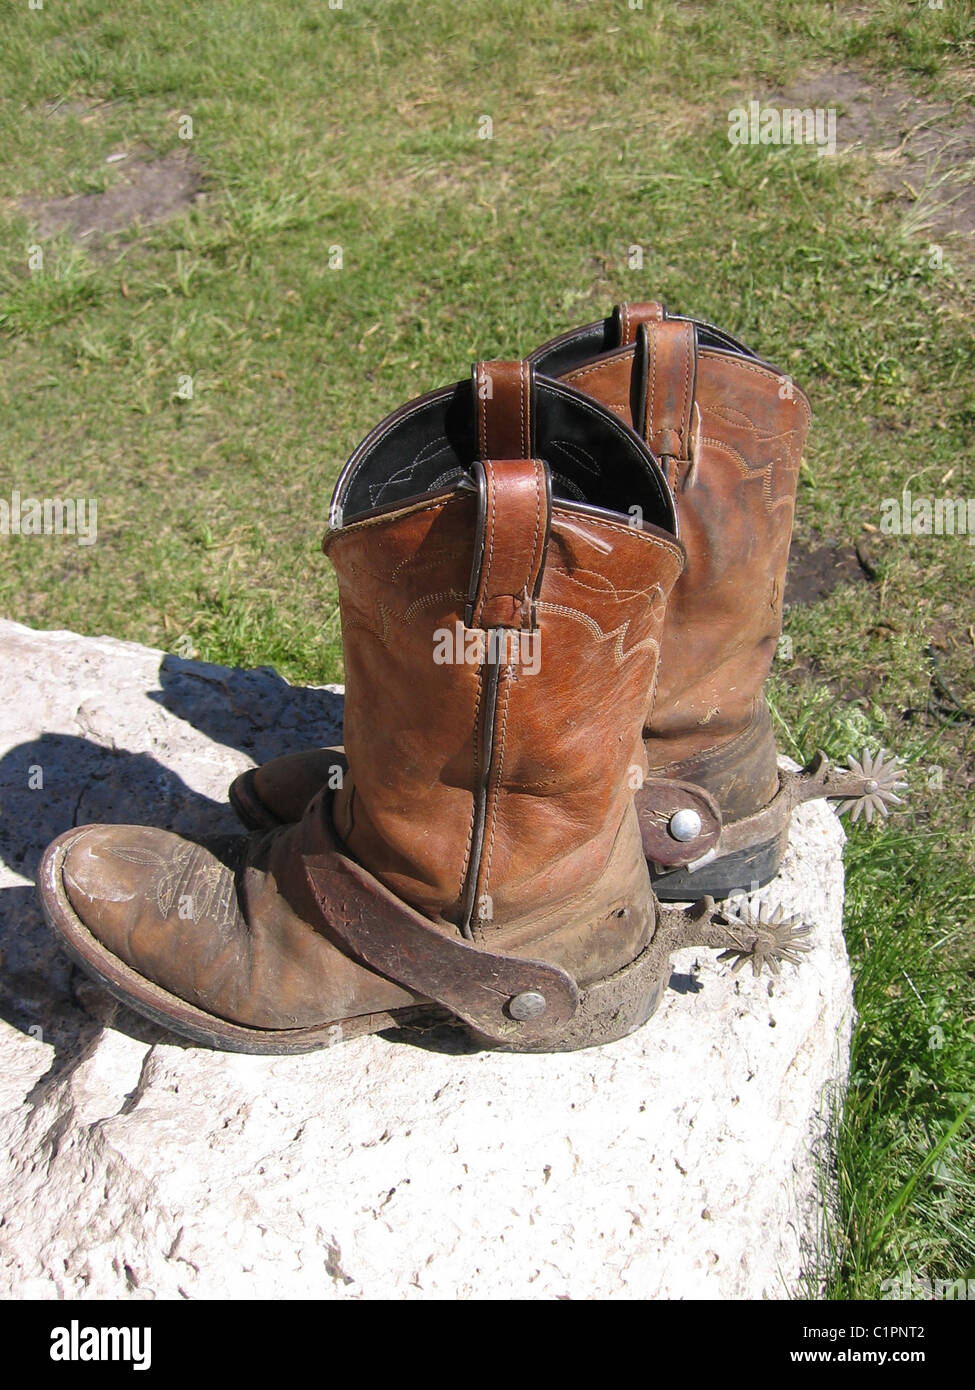 ba12bea24f6 Worn Leather Cowboy Boots Usa Stock Photos & Worn Leather Cowboy ...